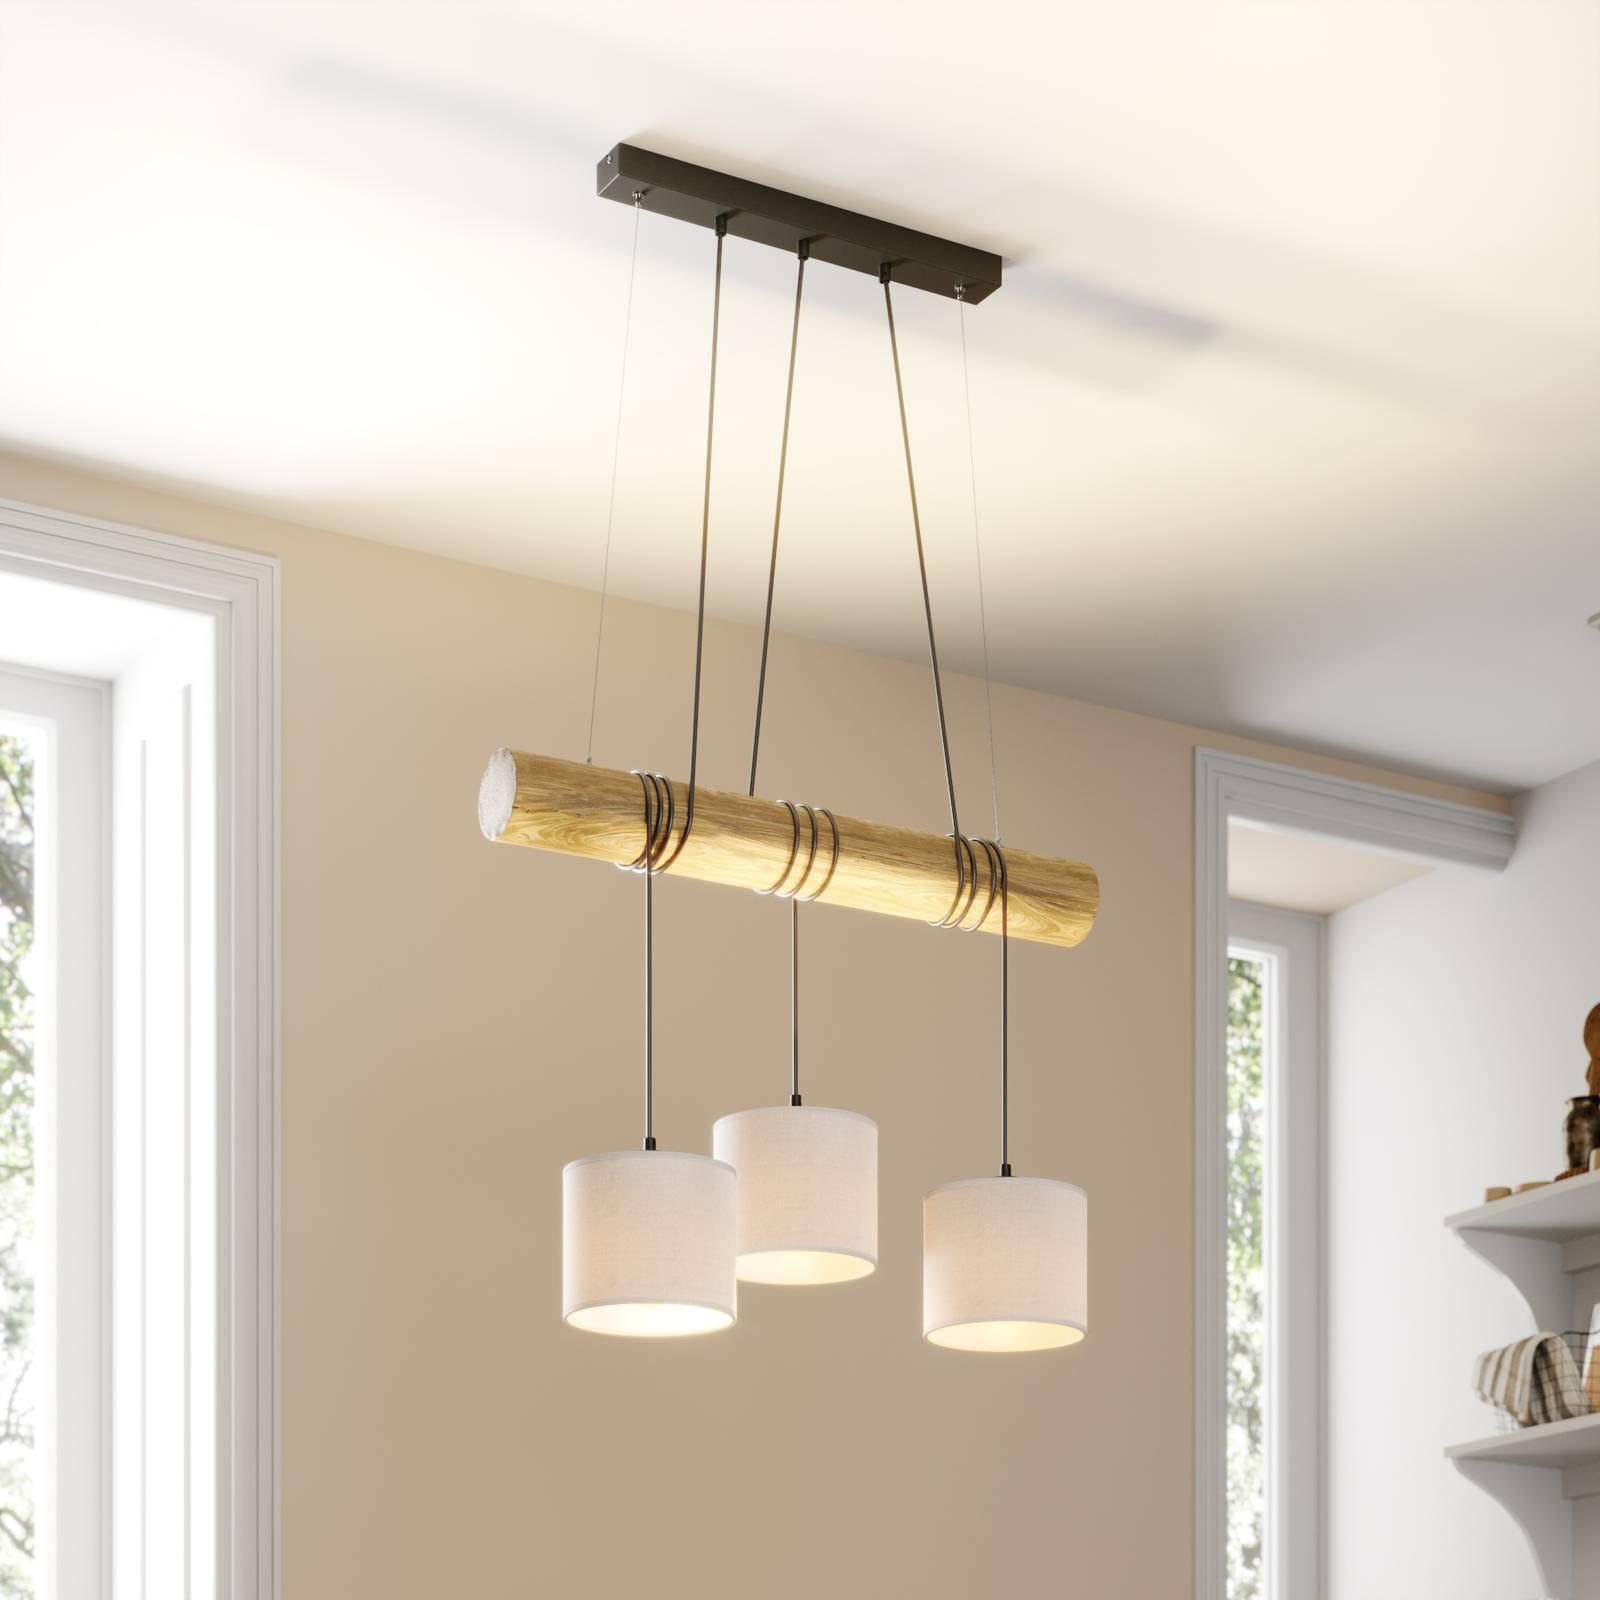 Hanglamp Sacide, houten balk, drie stoffen kappen